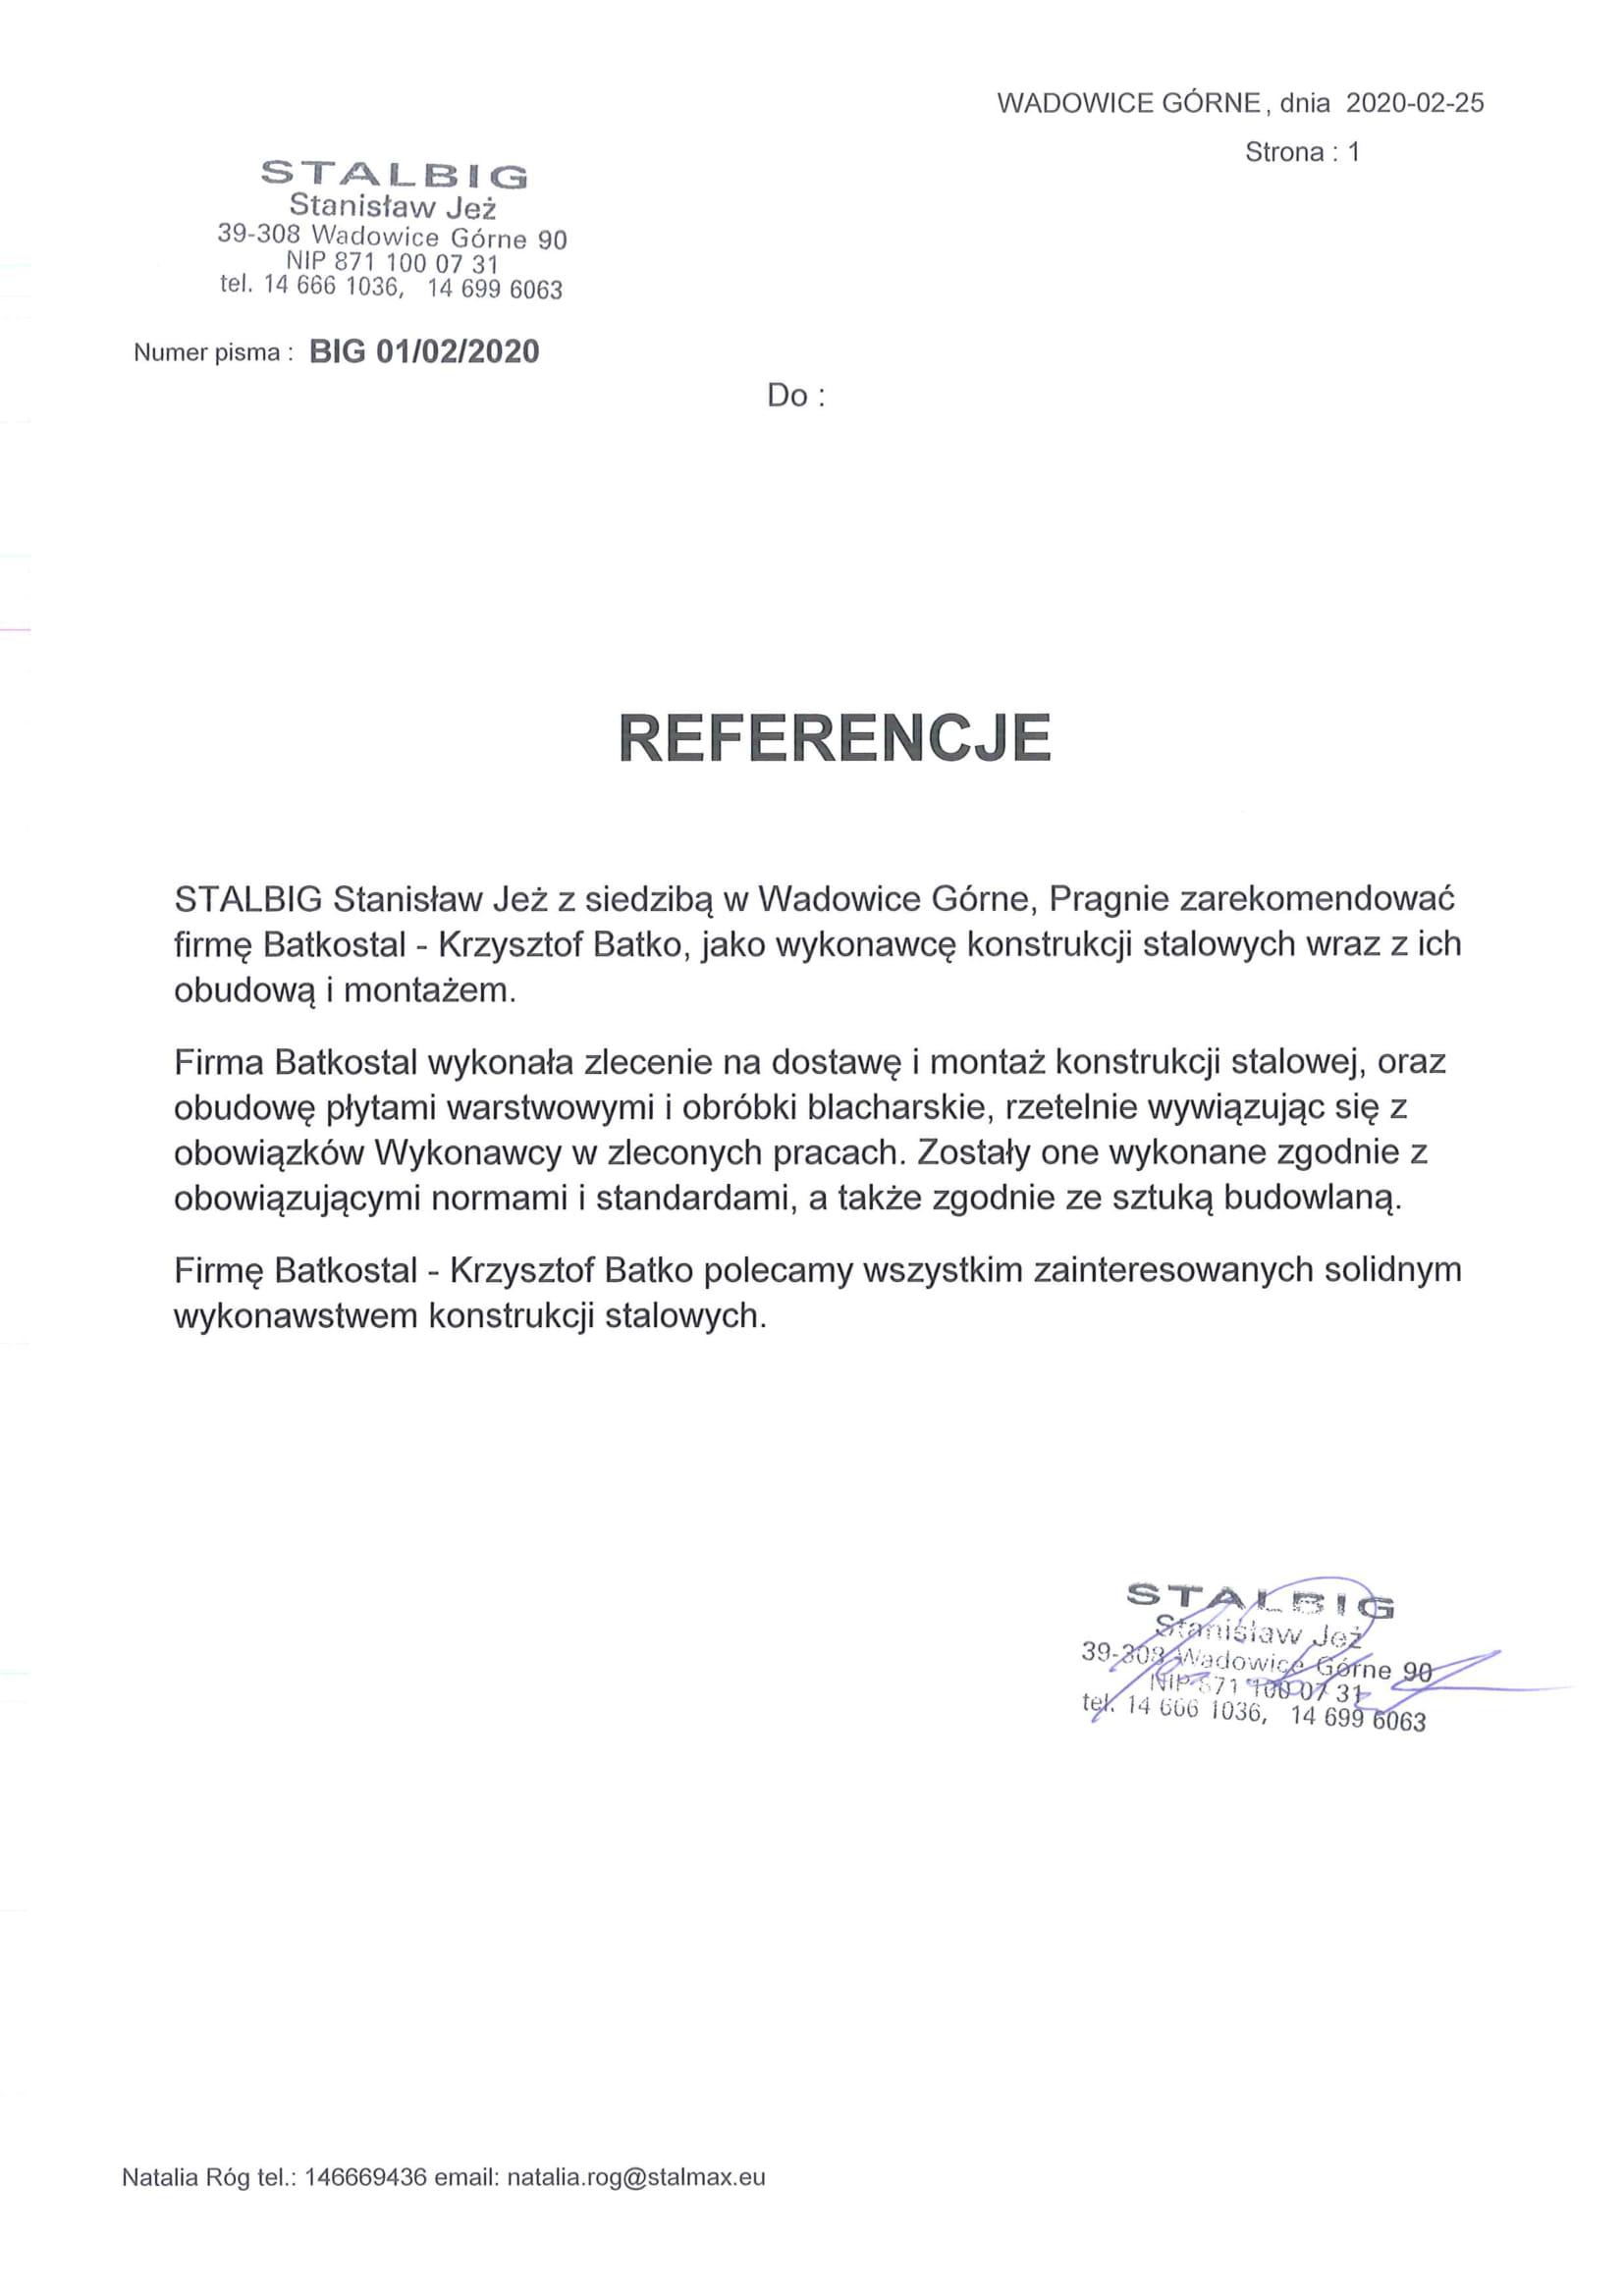 Referencje STALBIG-1